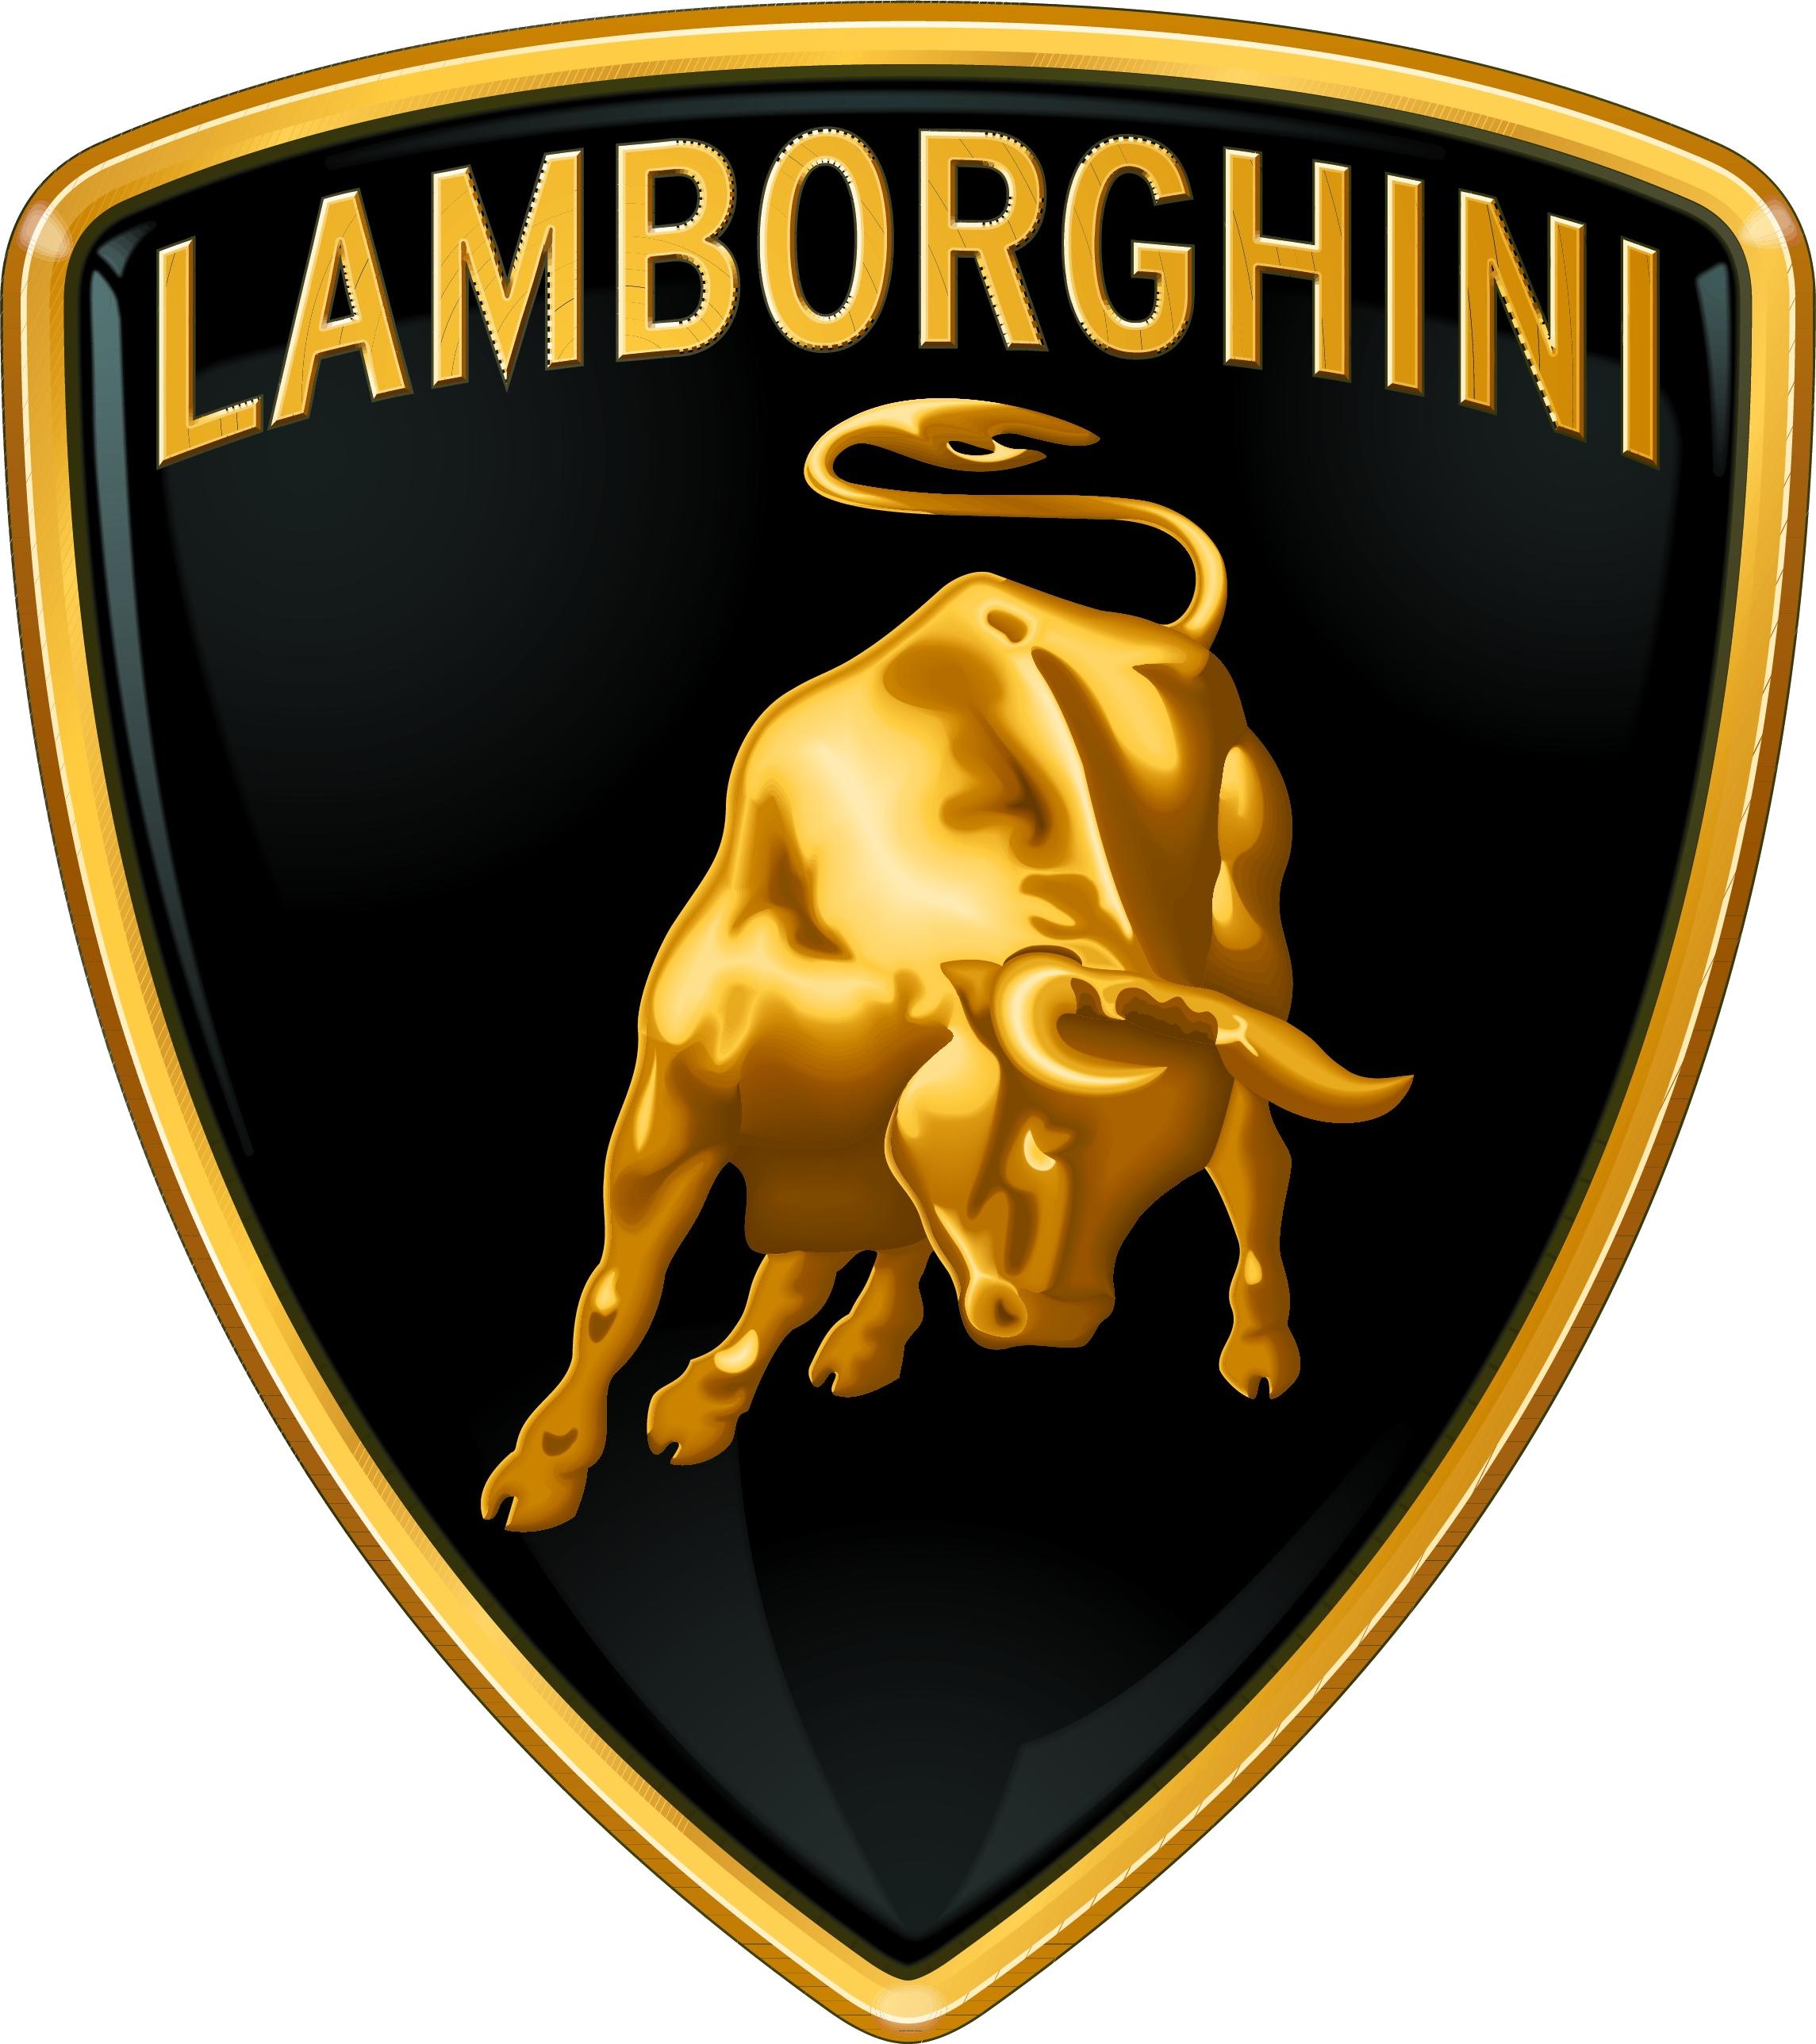 Lamborghini clipart lambo Download logo Lamborghini images image